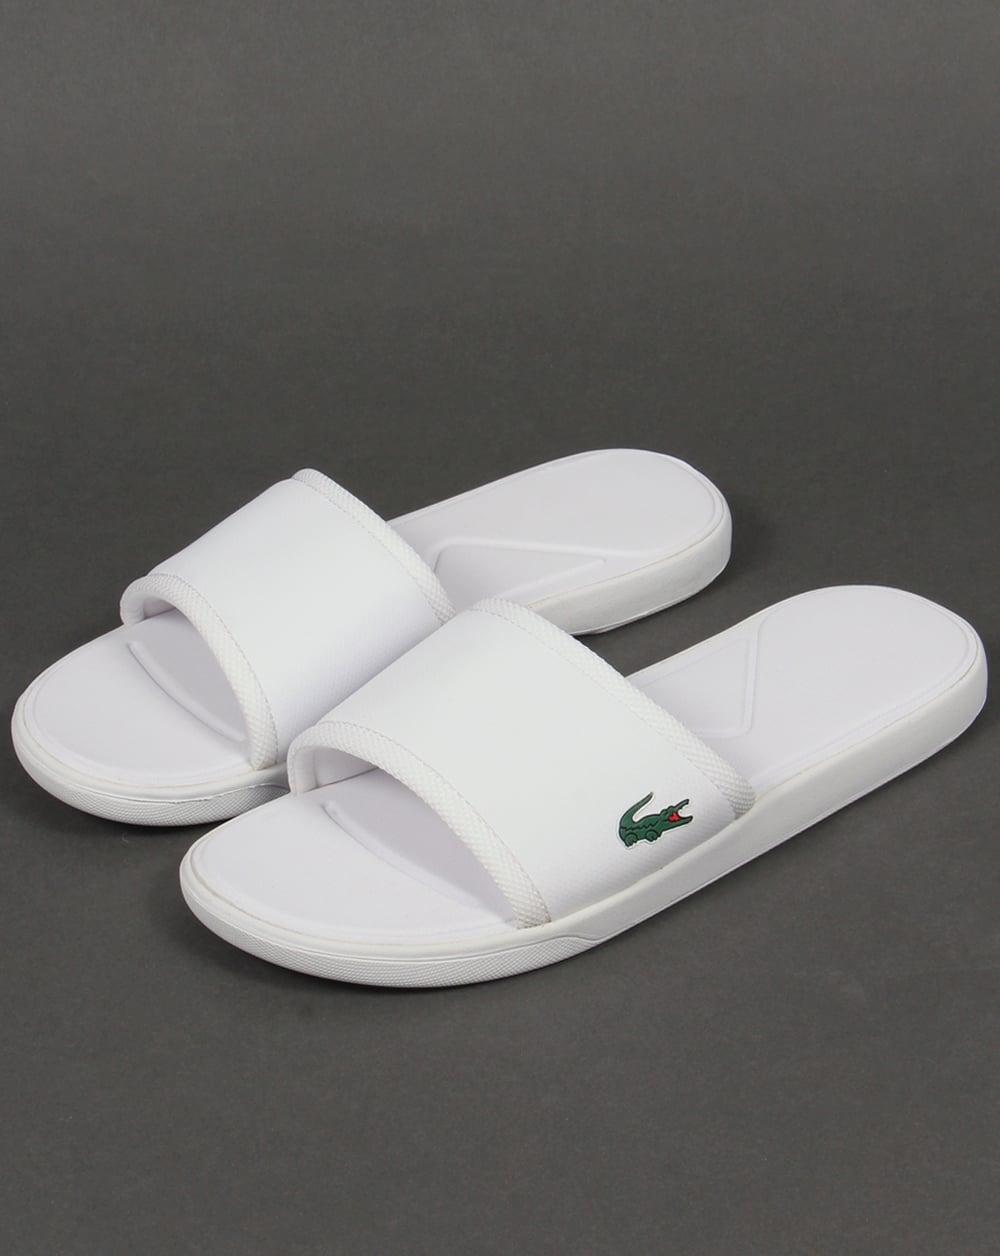 4ae17b46b Lacoste Lacoste L.30 Sport Sliders White